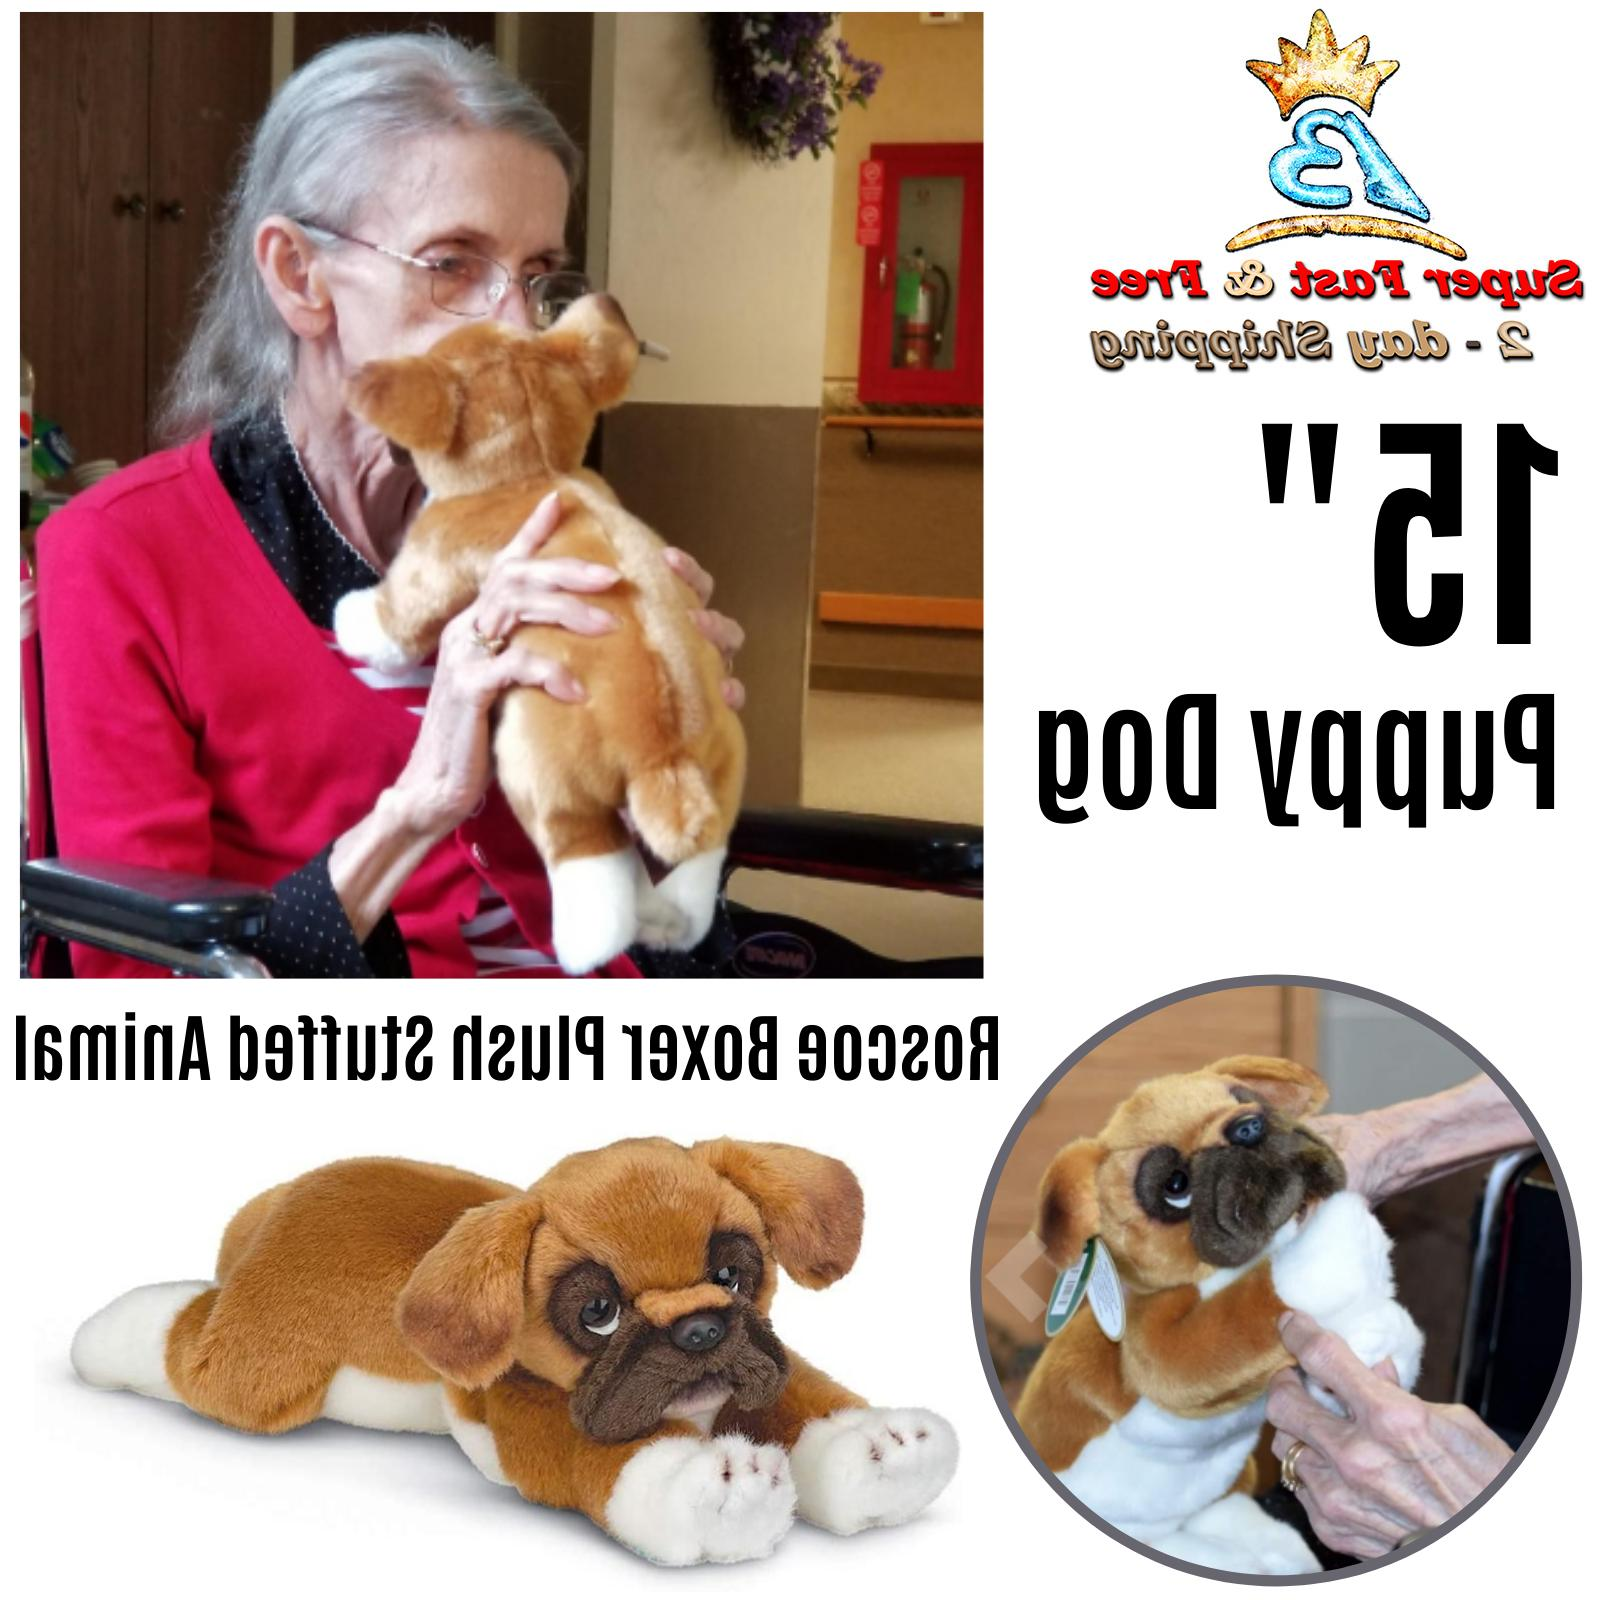 Stuffed Toy Puppy Dog Roscoe Boxer Kitten Animal Plush Colle